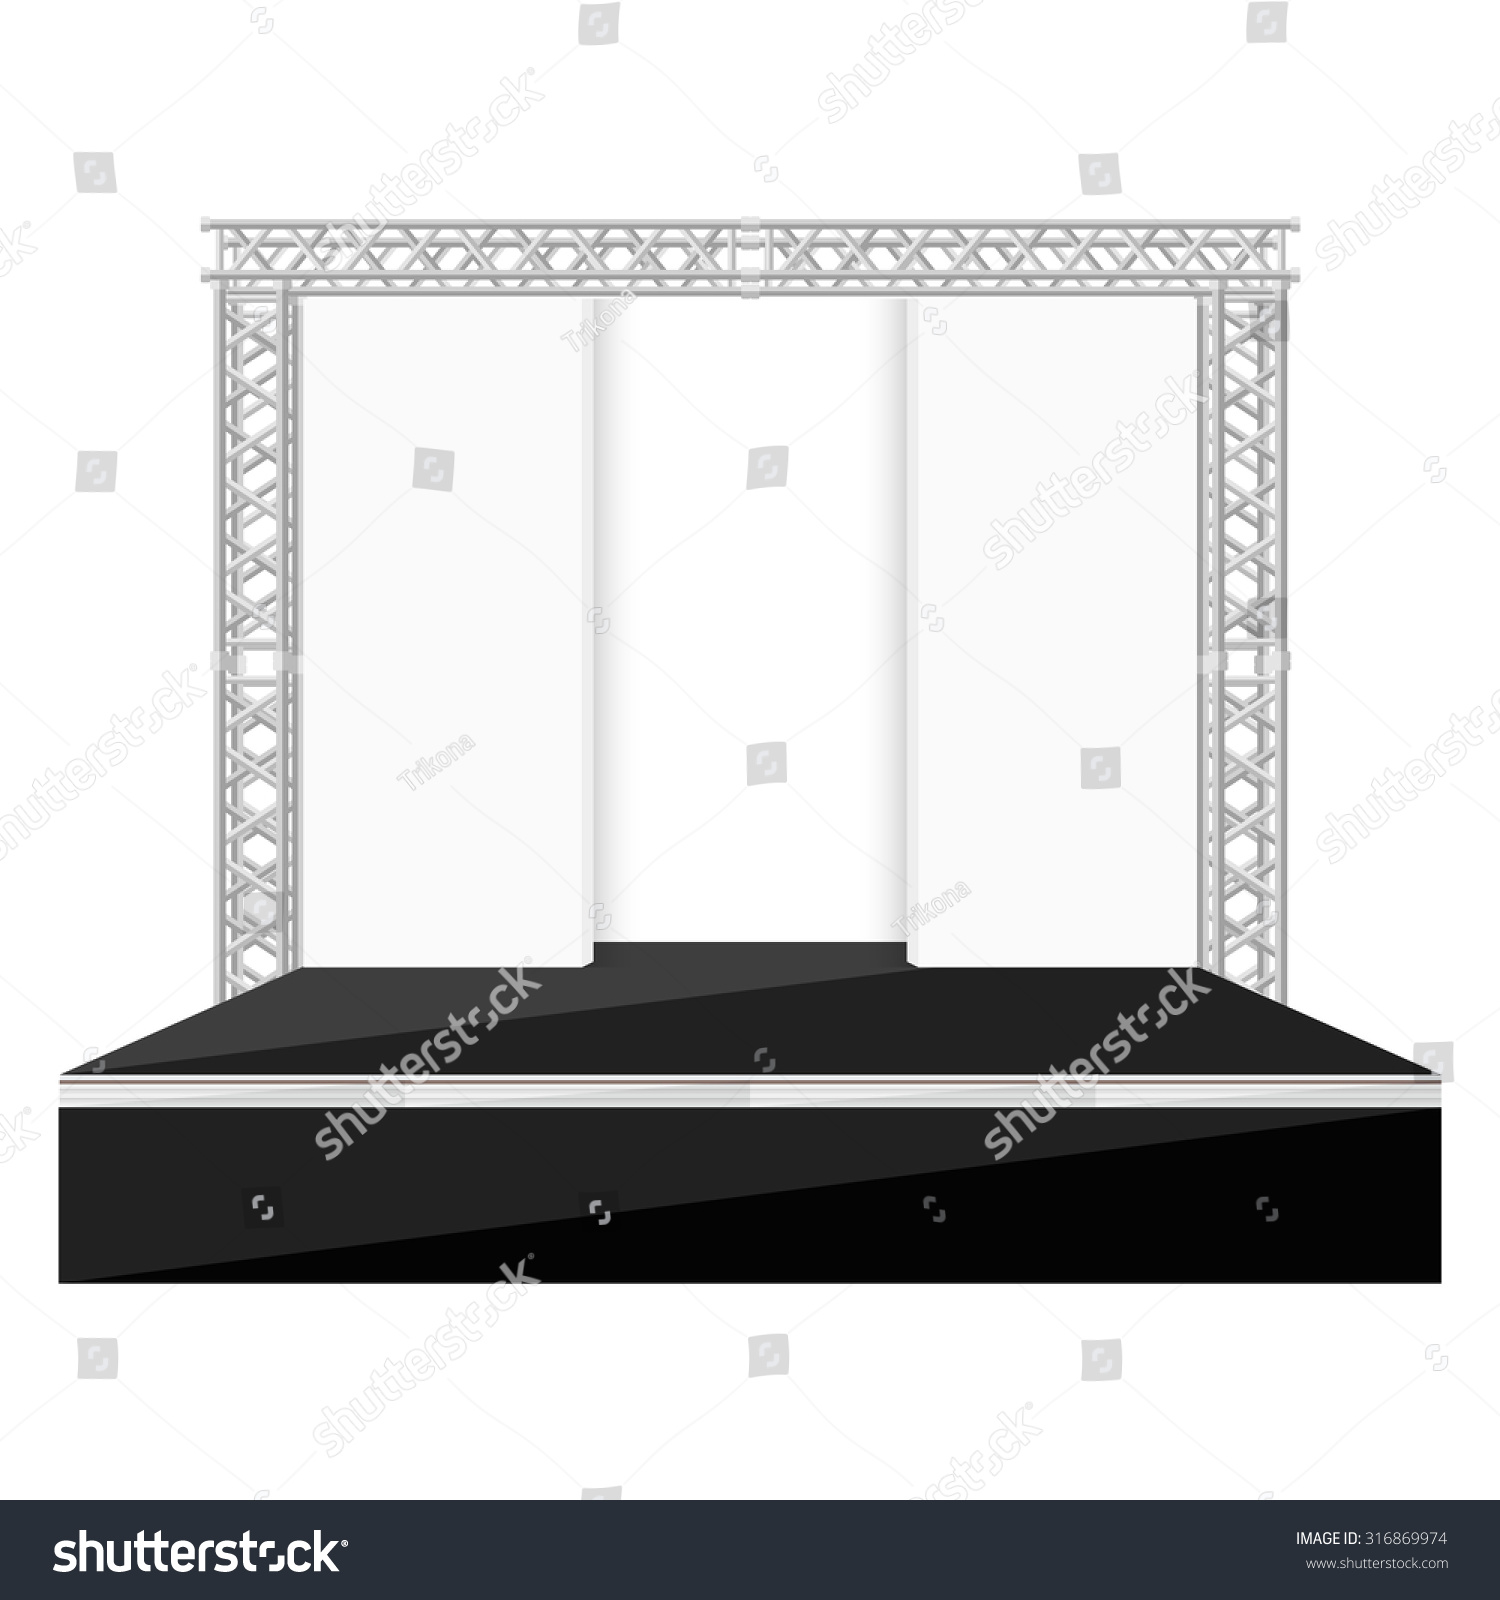 Empty outdoor concert stage -  Concert Stage Empty Outdoor Rock Stage Outdoor Stage Stock Vectors Vector Clip Art